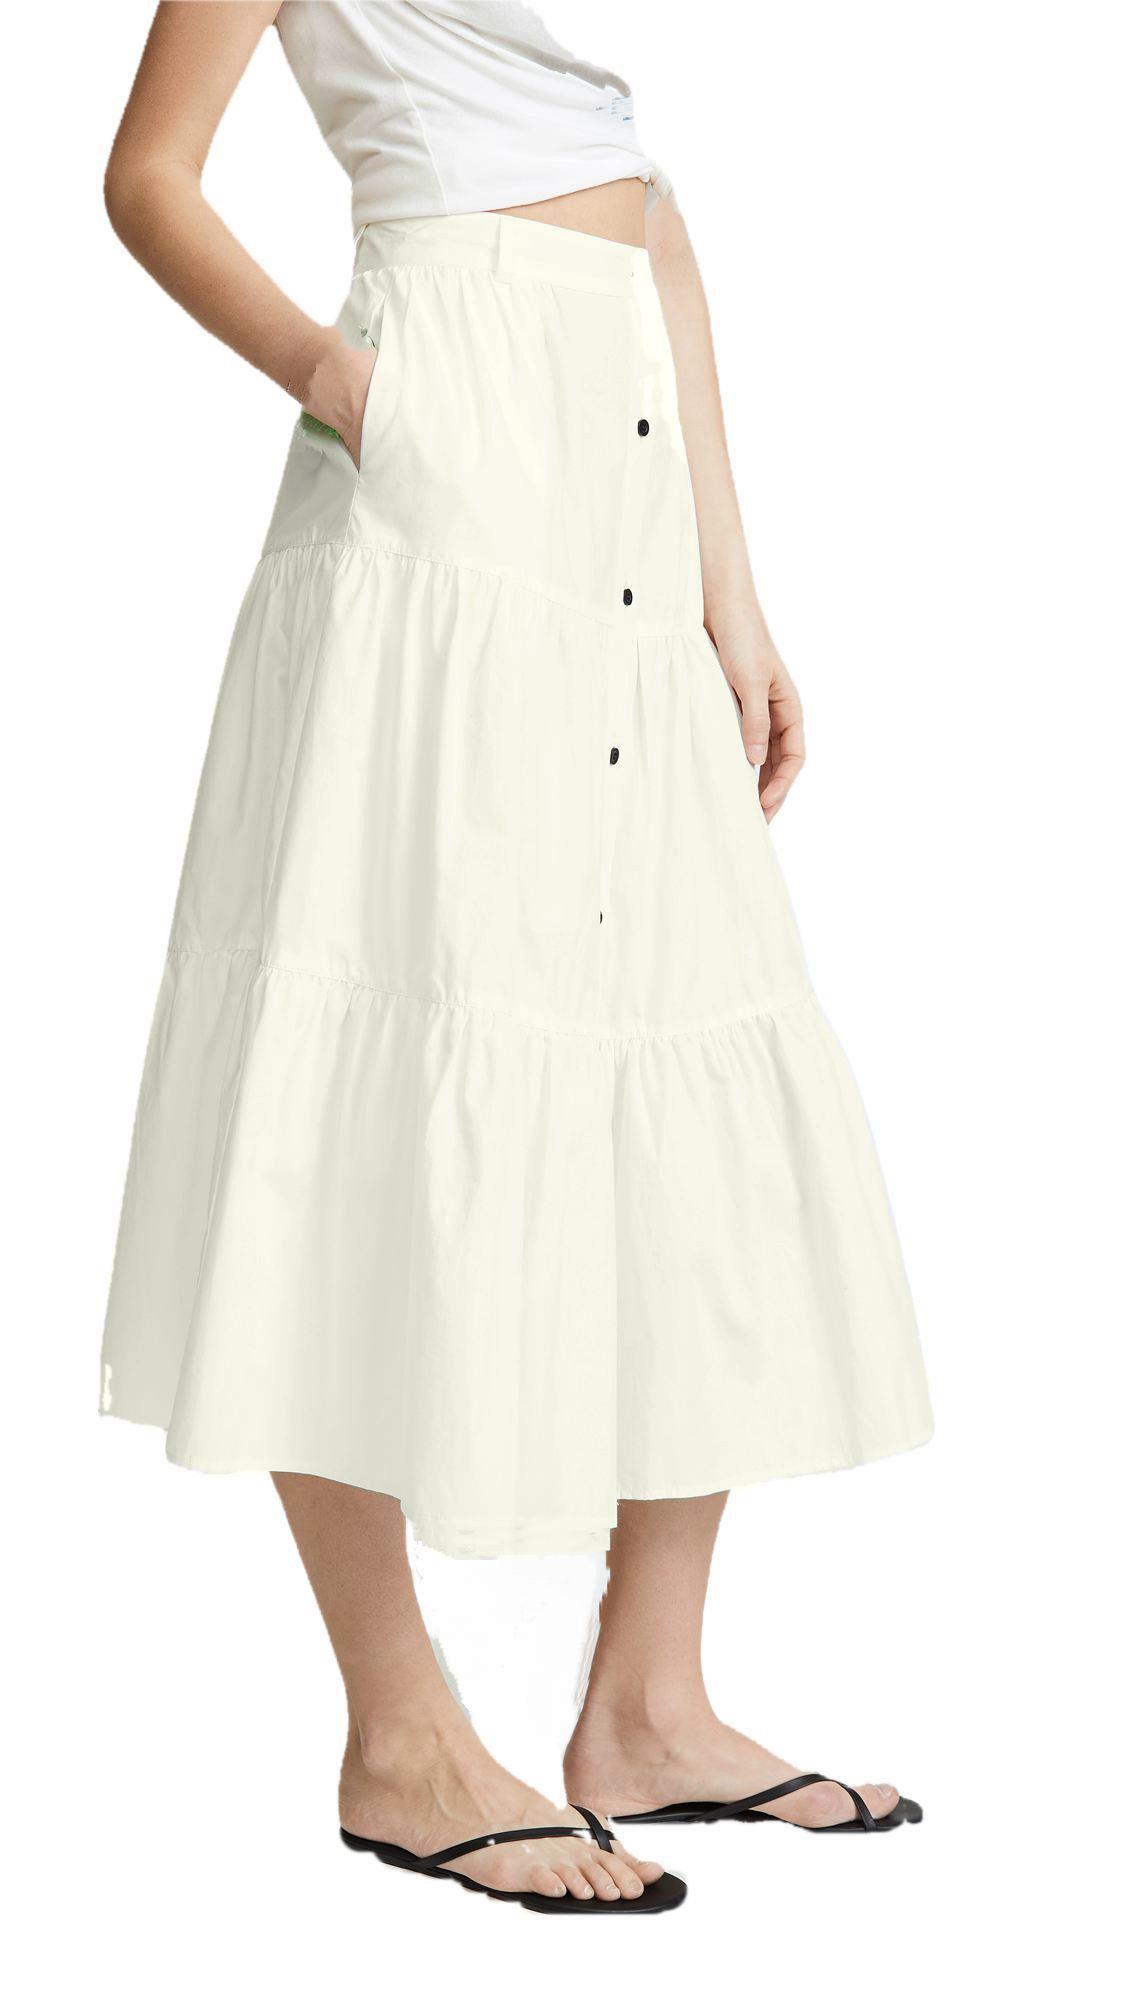 Below Knee Pleated Skirt in Off-White